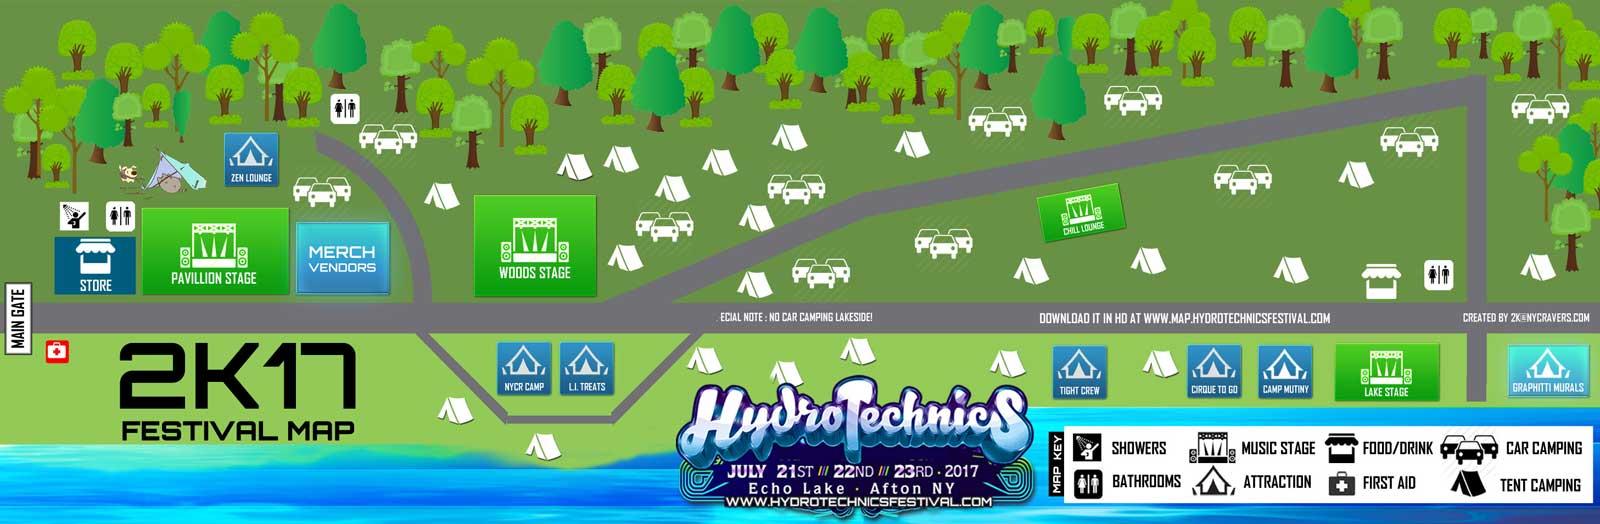 Hydrotechnics Festival 2K17 Festival Map HD